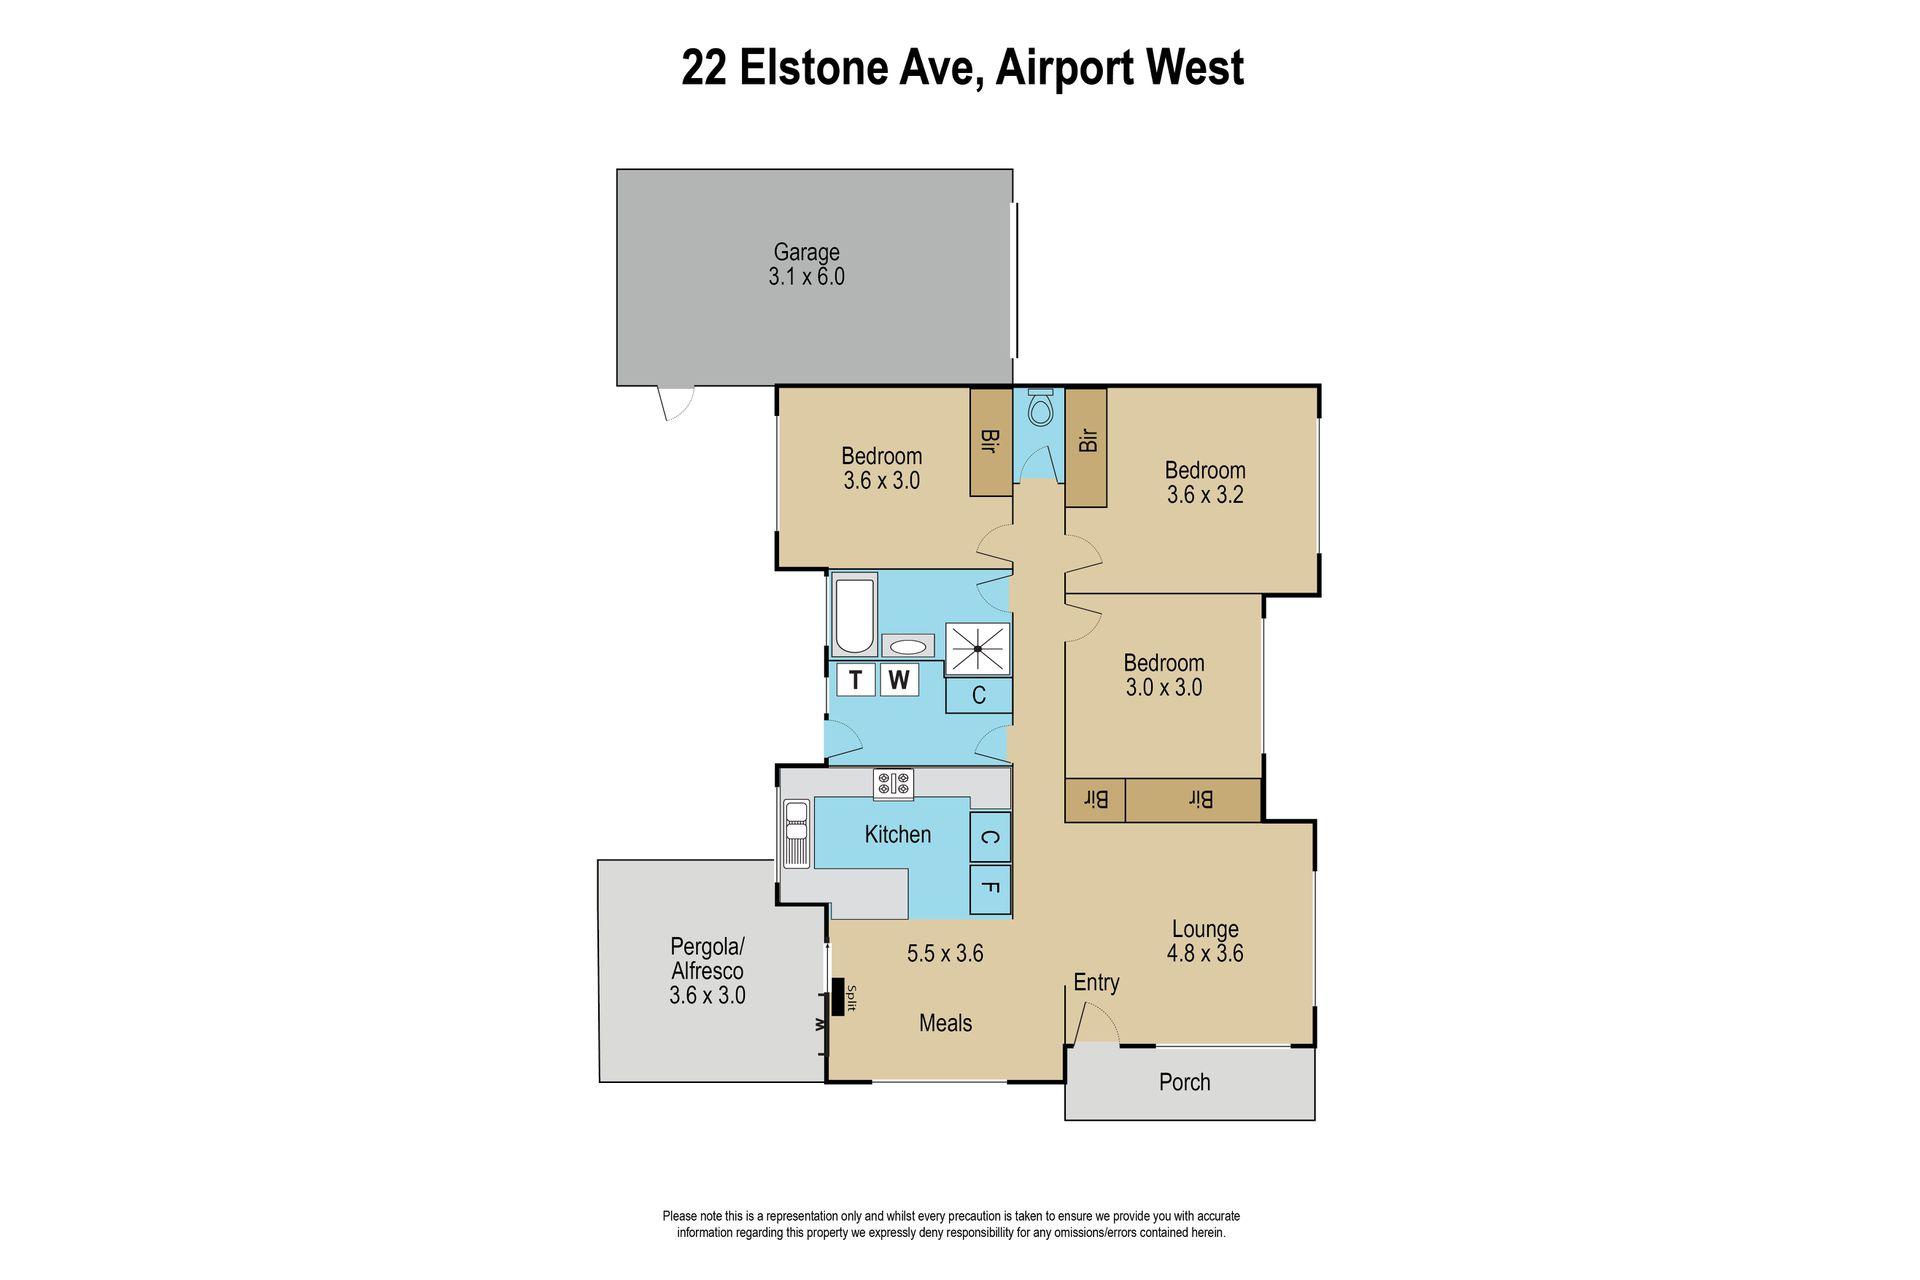 22 Elstone Avenue, Airport West